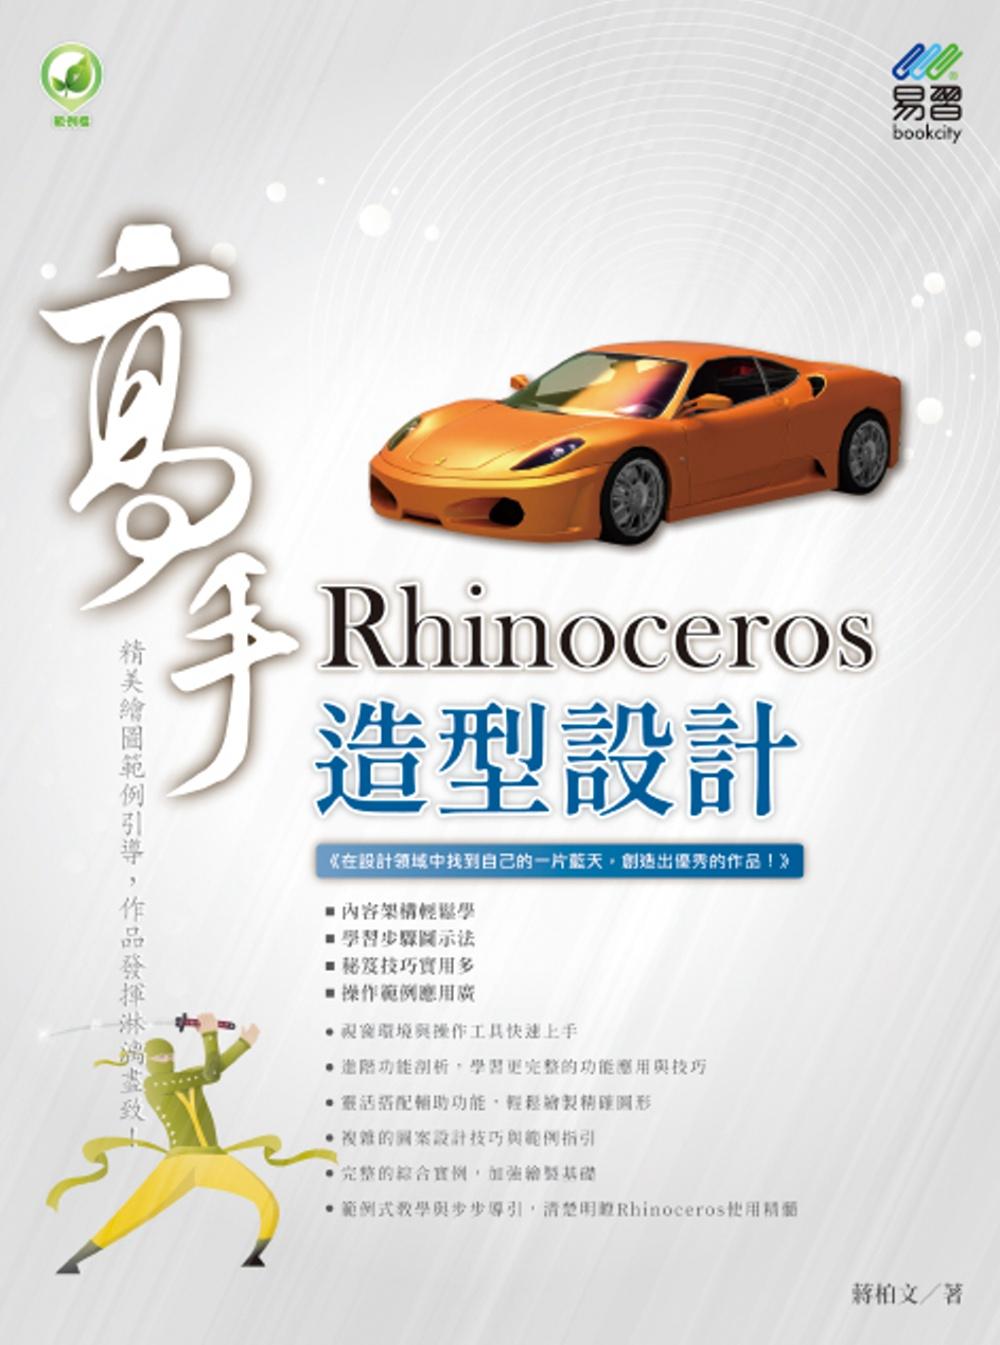 Rhinoceros 造型設計高手